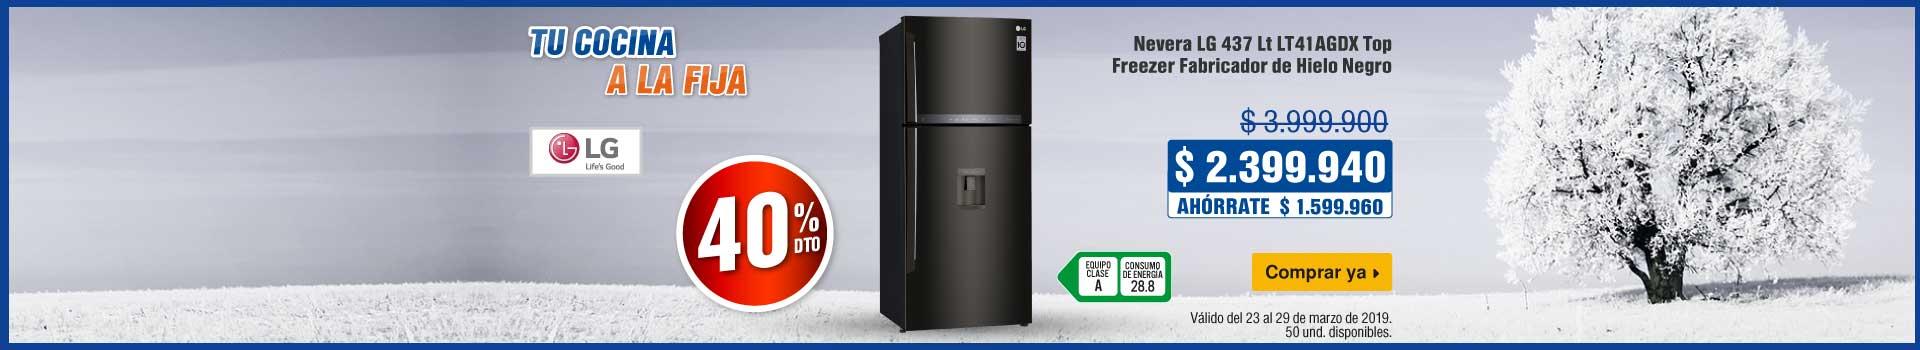 AK-KT-mayores-1-ELECT-BCAT-refrigeracion-LG-230319-extra